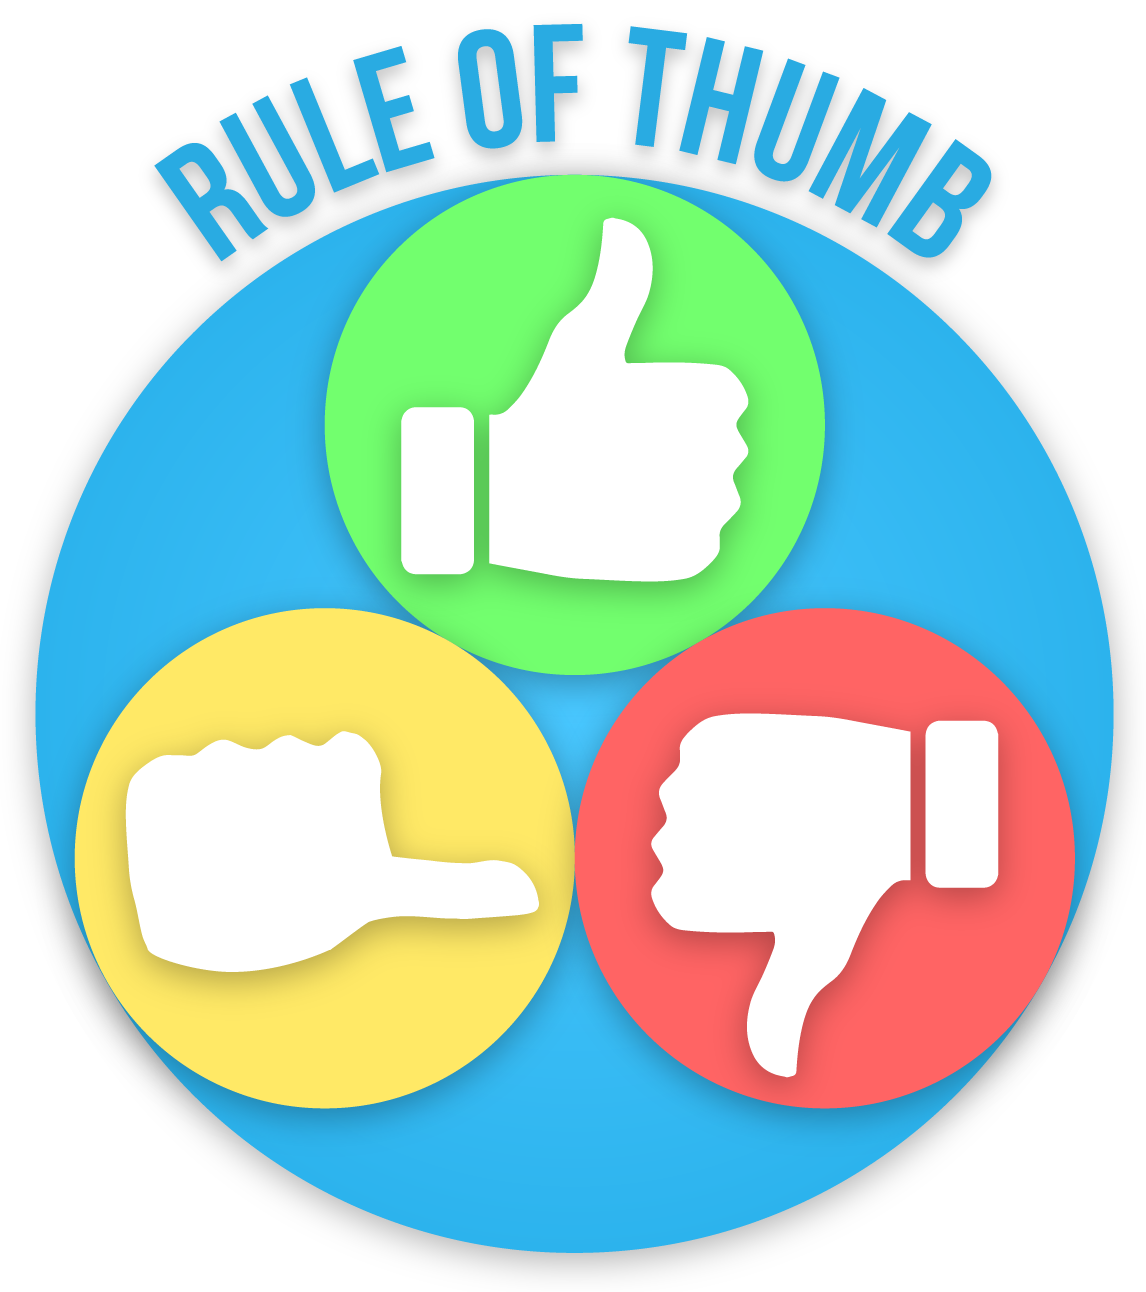 Thumb clipart rule thumb. Of opinion laloyolan com